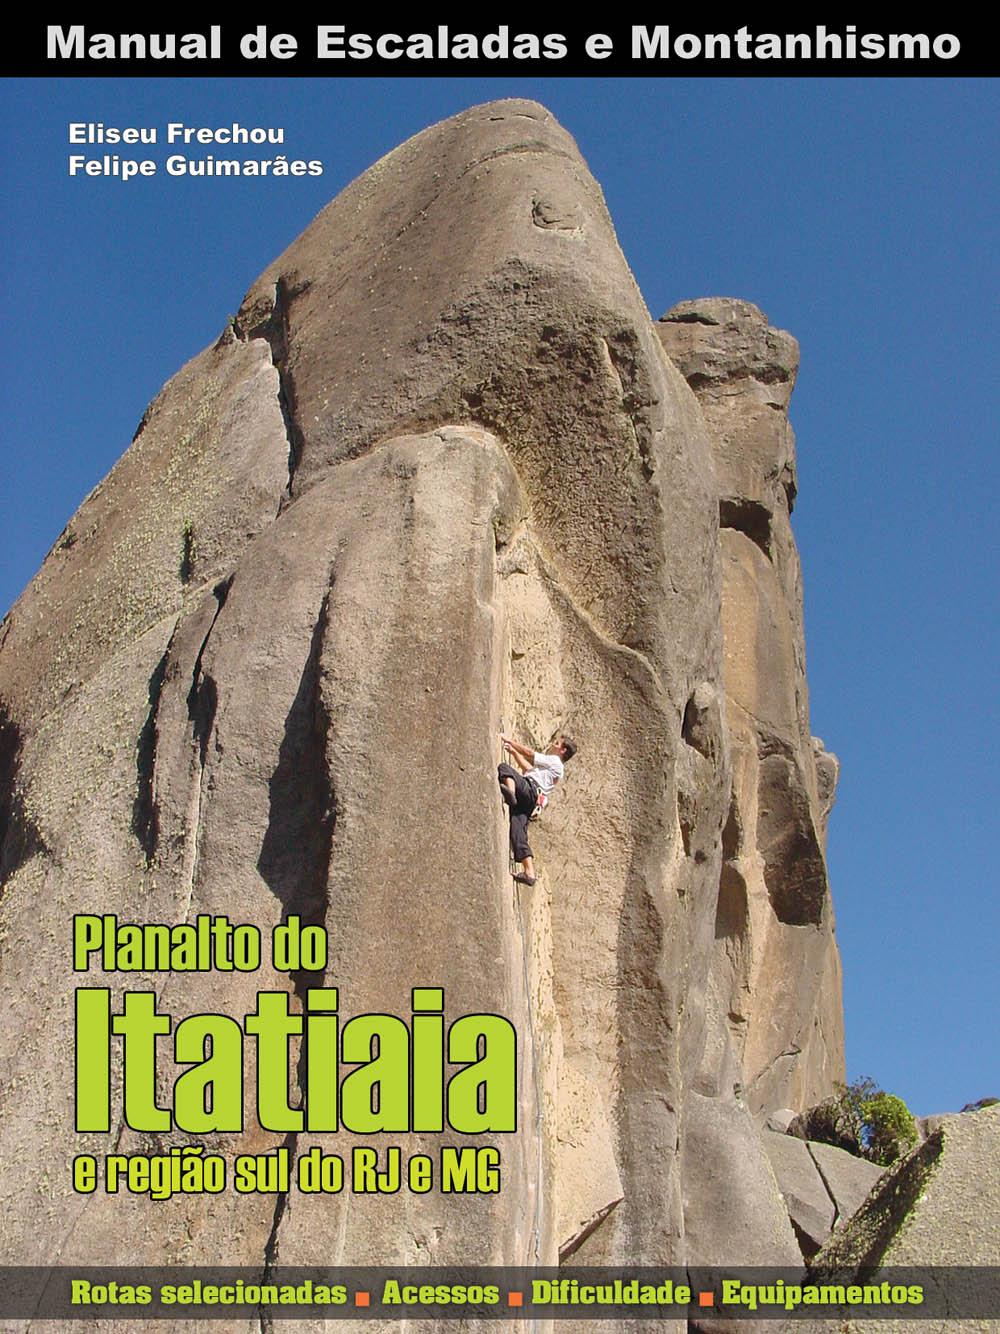 Manual de Escaladas de Itatiaia dos autores Eliseu Frechou e Felipe Guimarães.